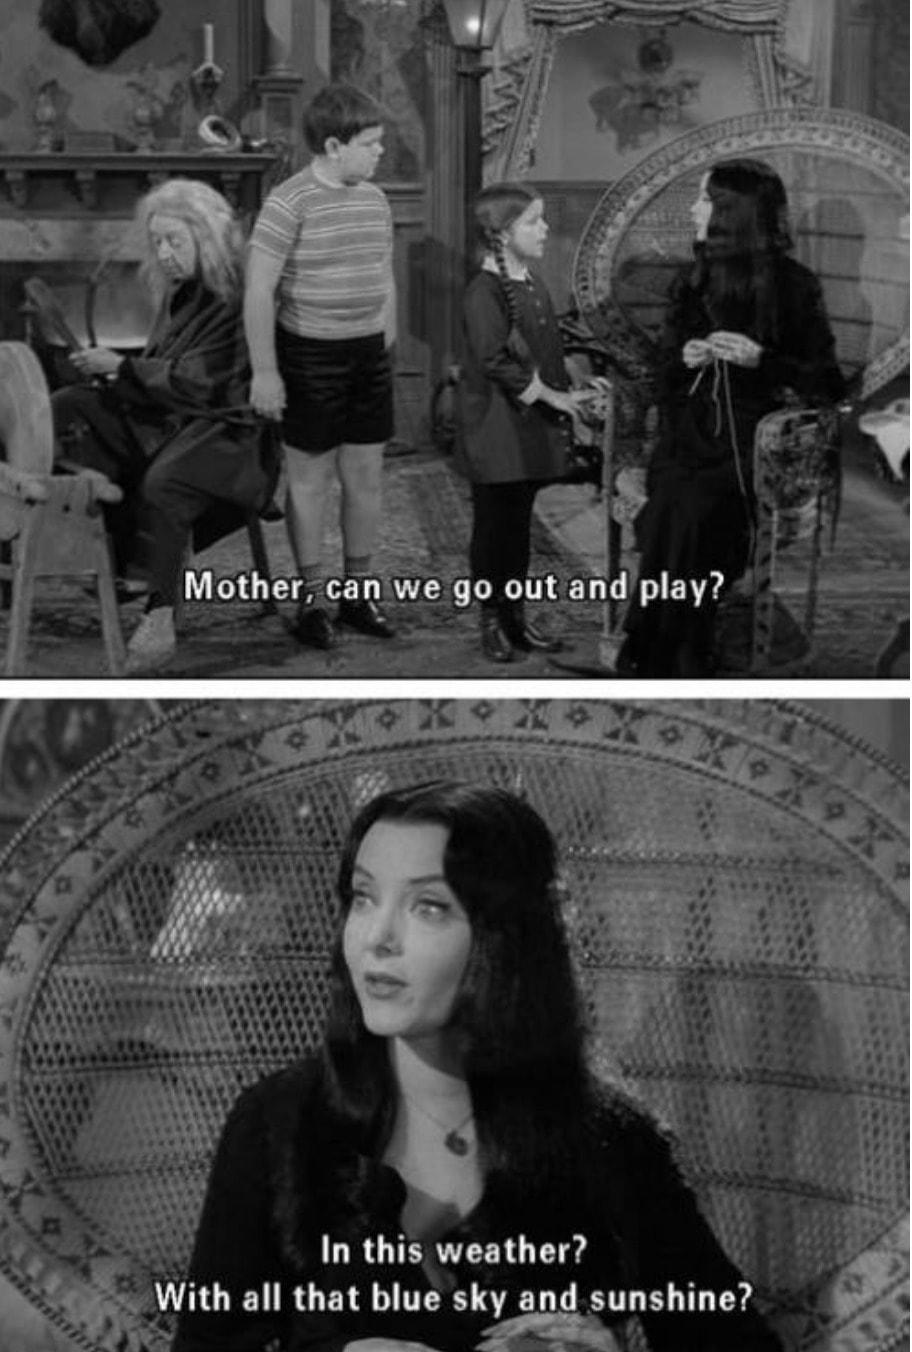 Addams quotes and morticia gomez The Addams